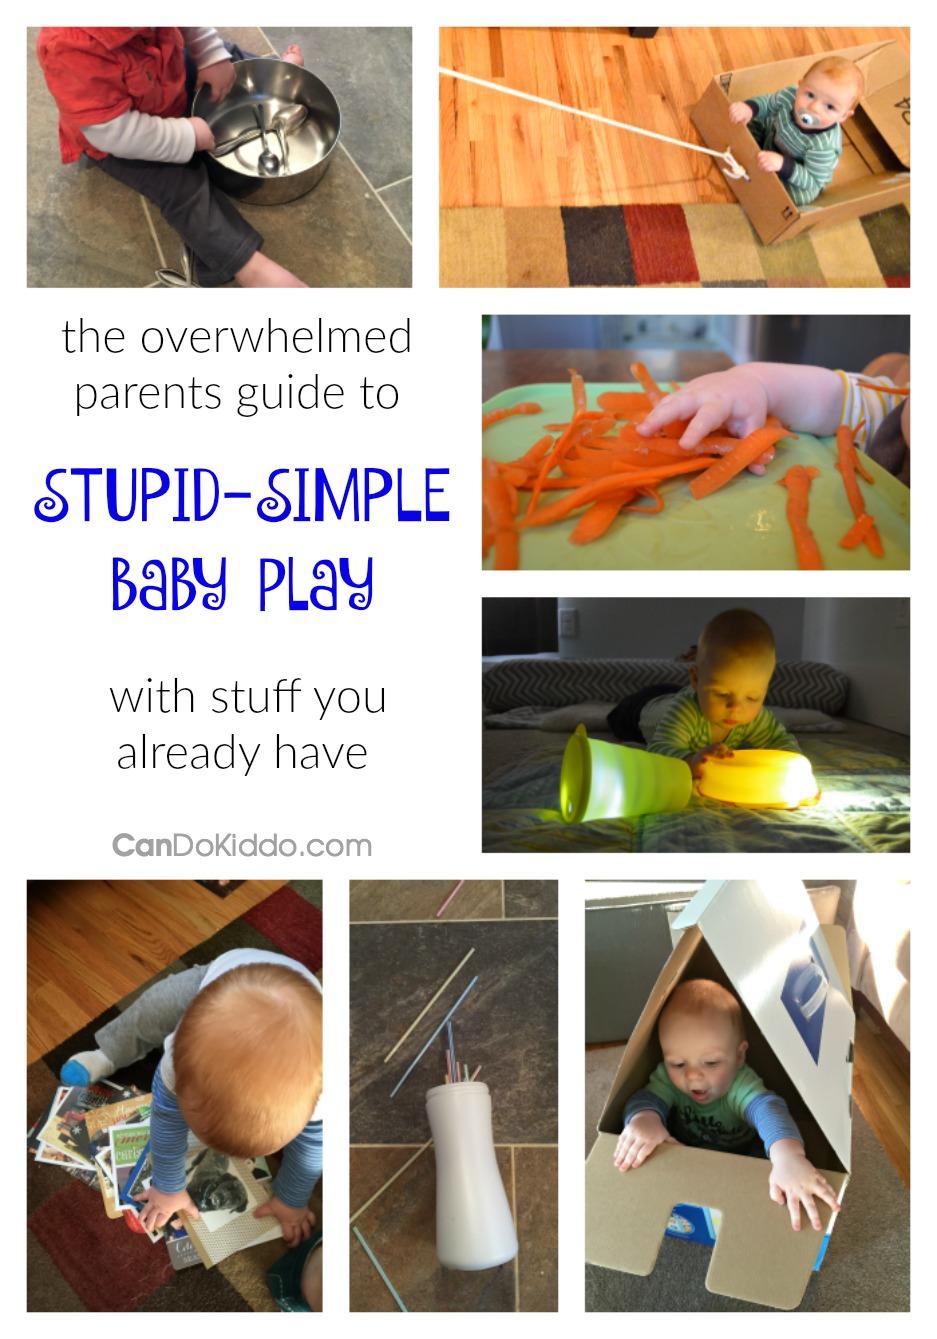 Stop the Pinterest Baby Play Paralysis! Stupid-Simple Play ideas. CanDoKiddo.com